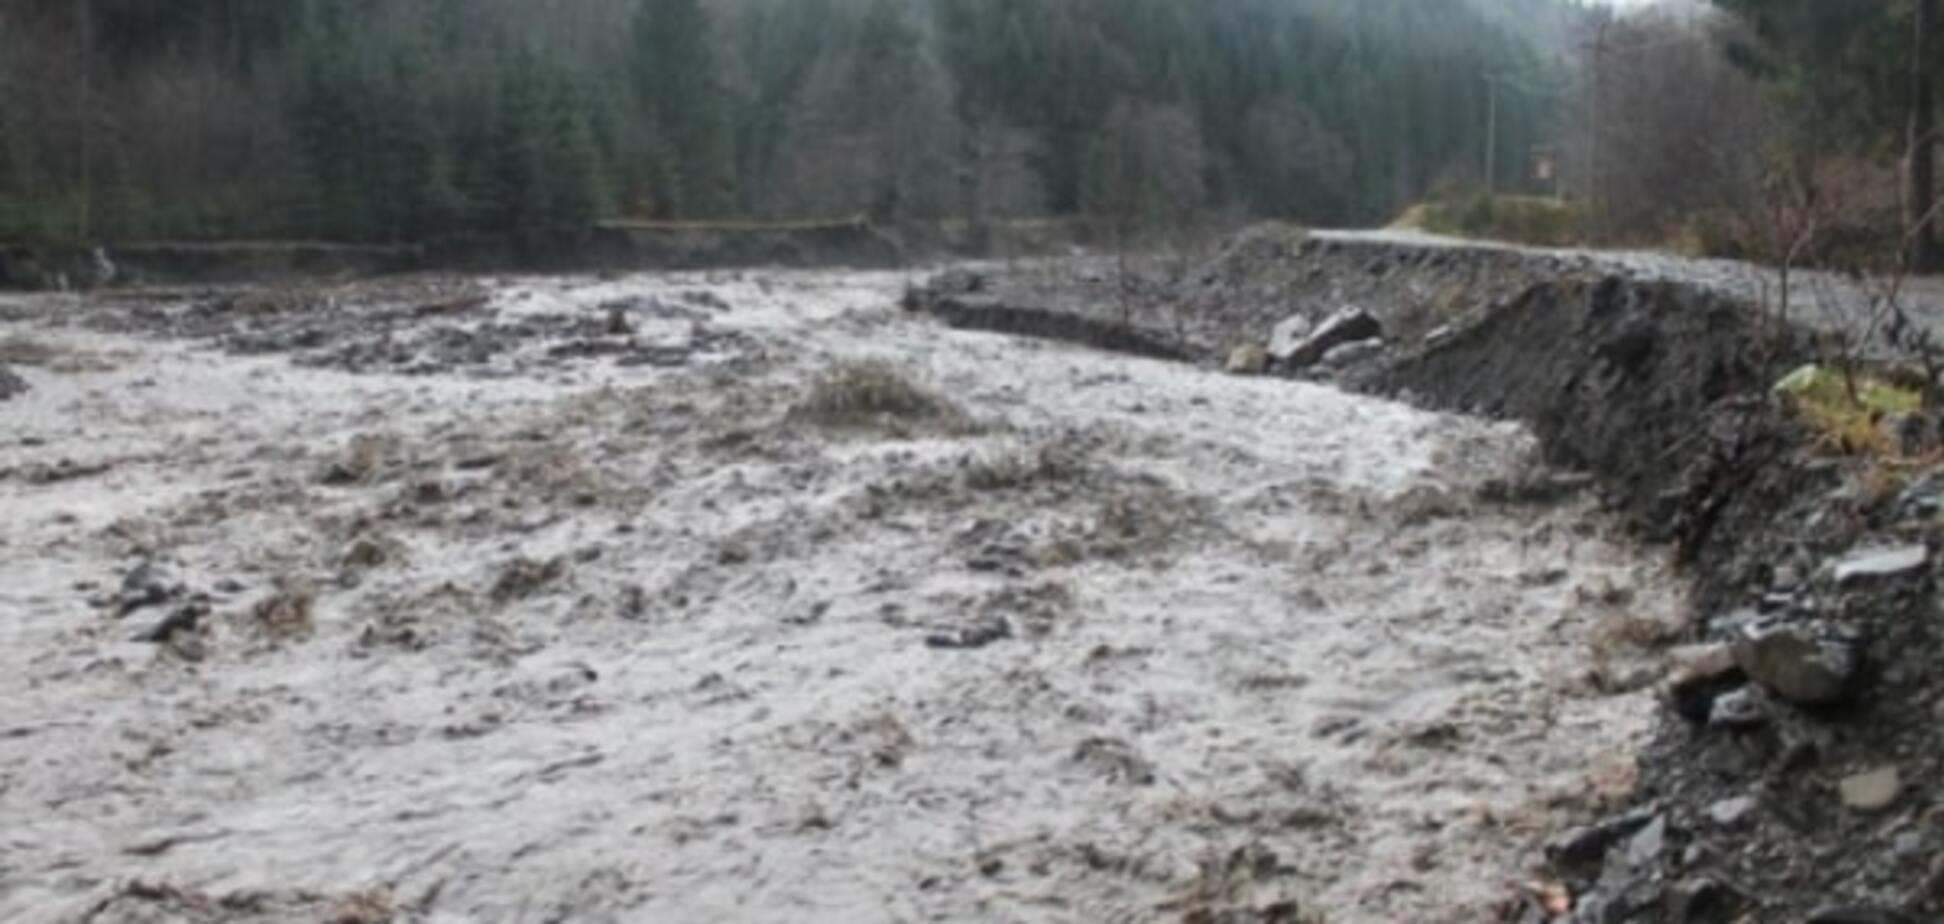 Сума збитку від паводку на Закарпатті понад 2 млрд грн - Москаль